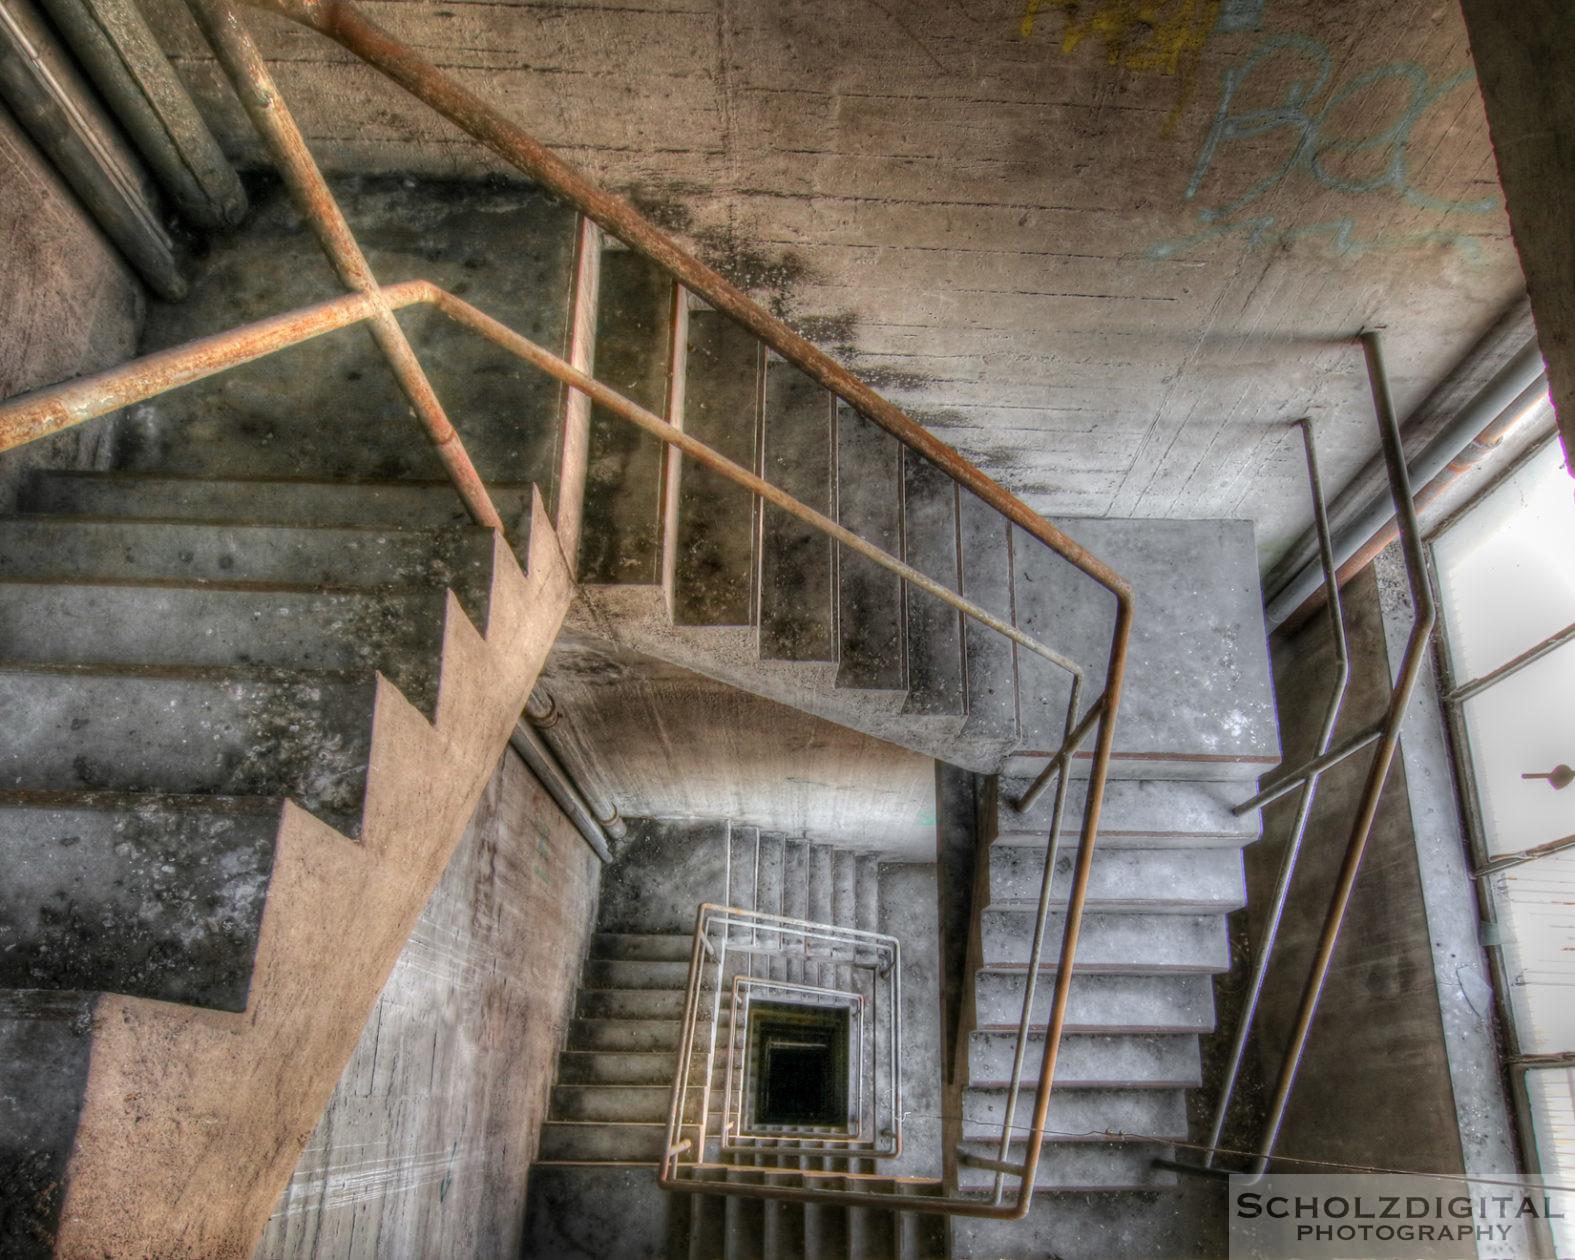 Tierfutterfabrik, Lost Place, Urbex, Verlassener Ort, Industrie